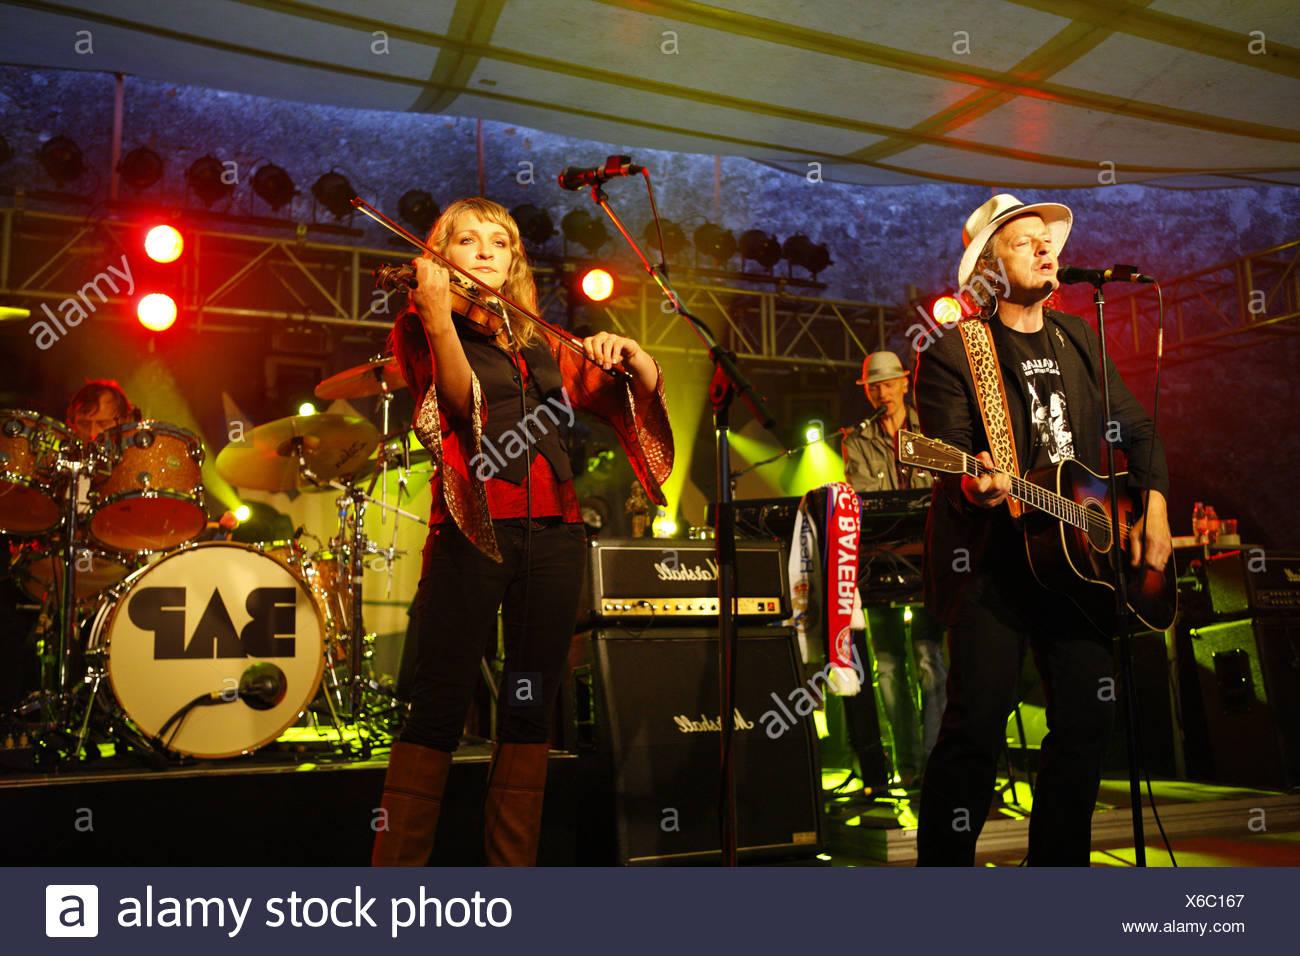 BAP, Cologne rock band, open air concert, Muehldorf am Inn, Bavaria, Germany Stock Photo